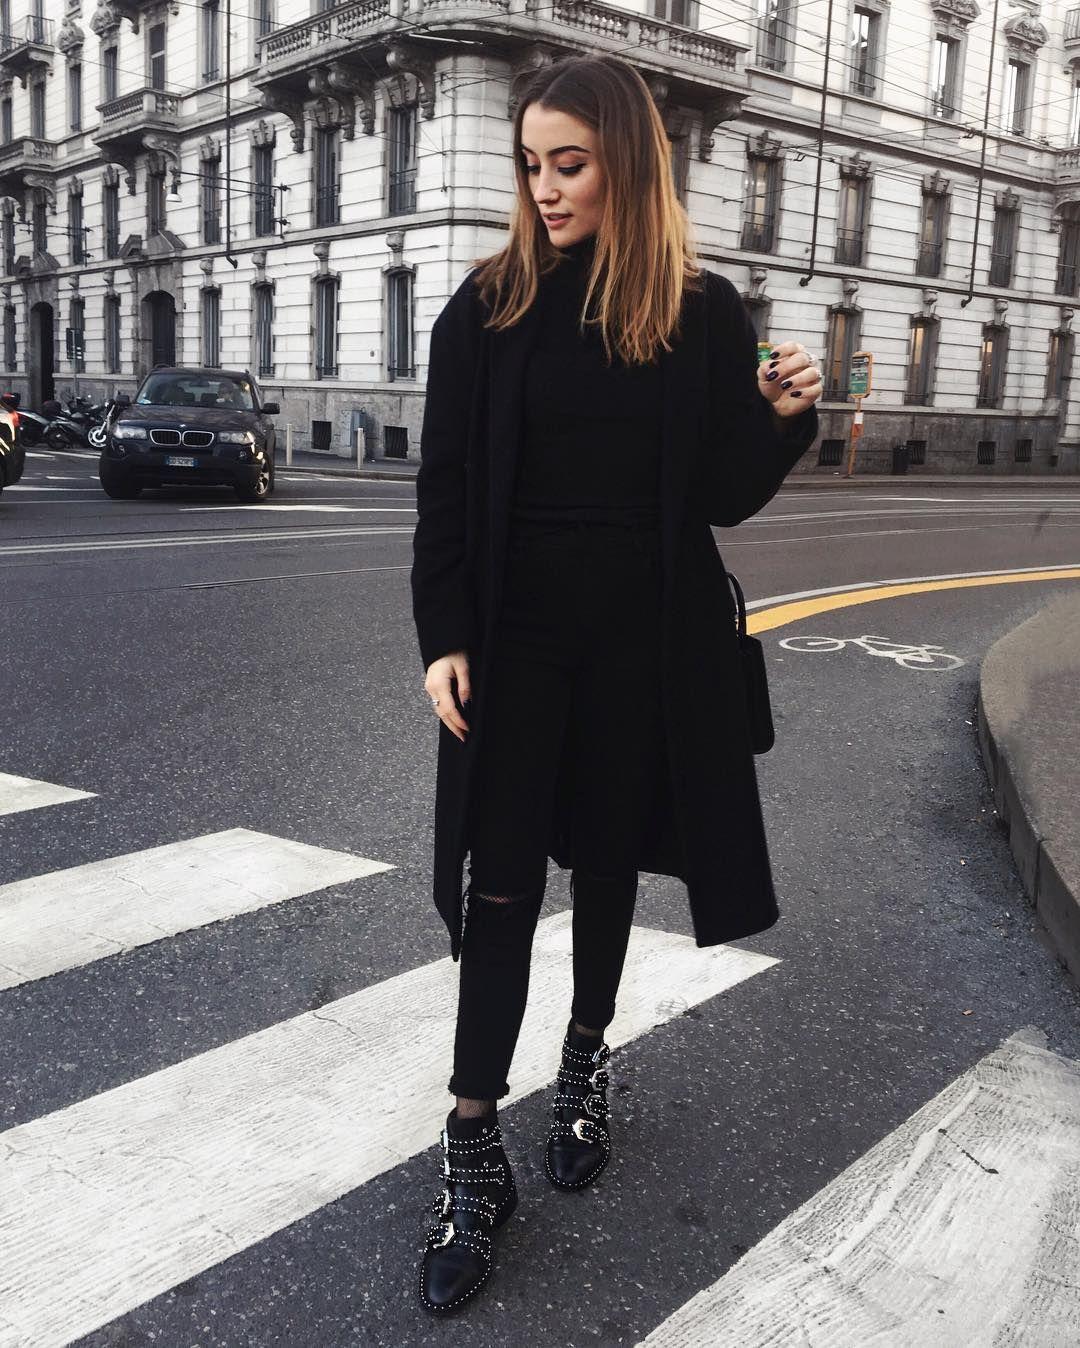 chlo b chloebbbb photos et vid os instagram black white outfits pinterest fashion. Black Bedroom Furniture Sets. Home Design Ideas